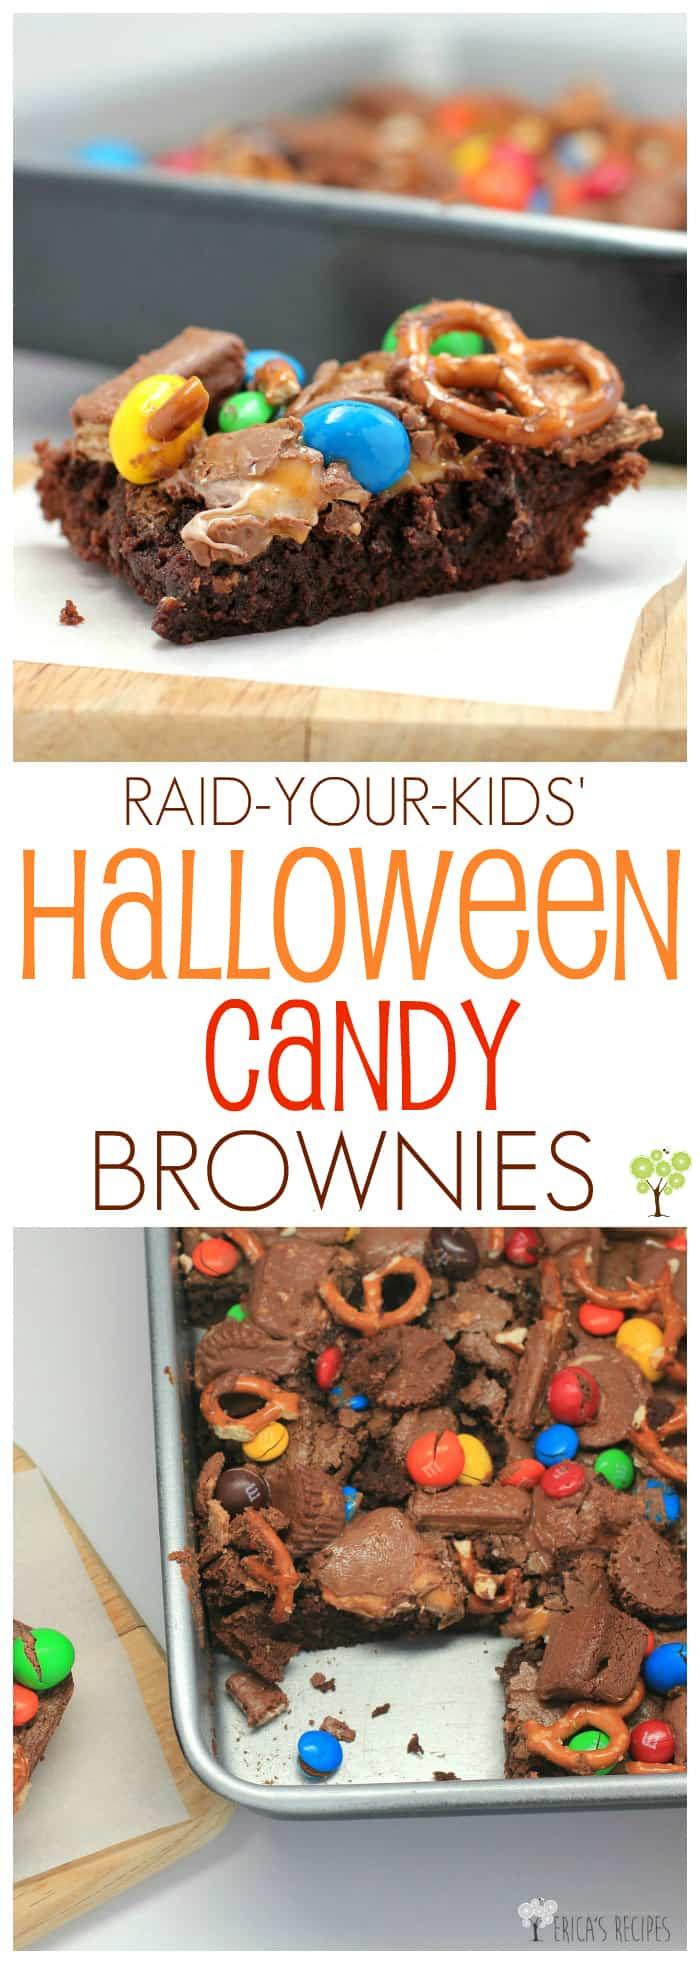 Raid-Your-Kids' Halloween Candy Brownies #recipe #halloween #candy #brownies #food